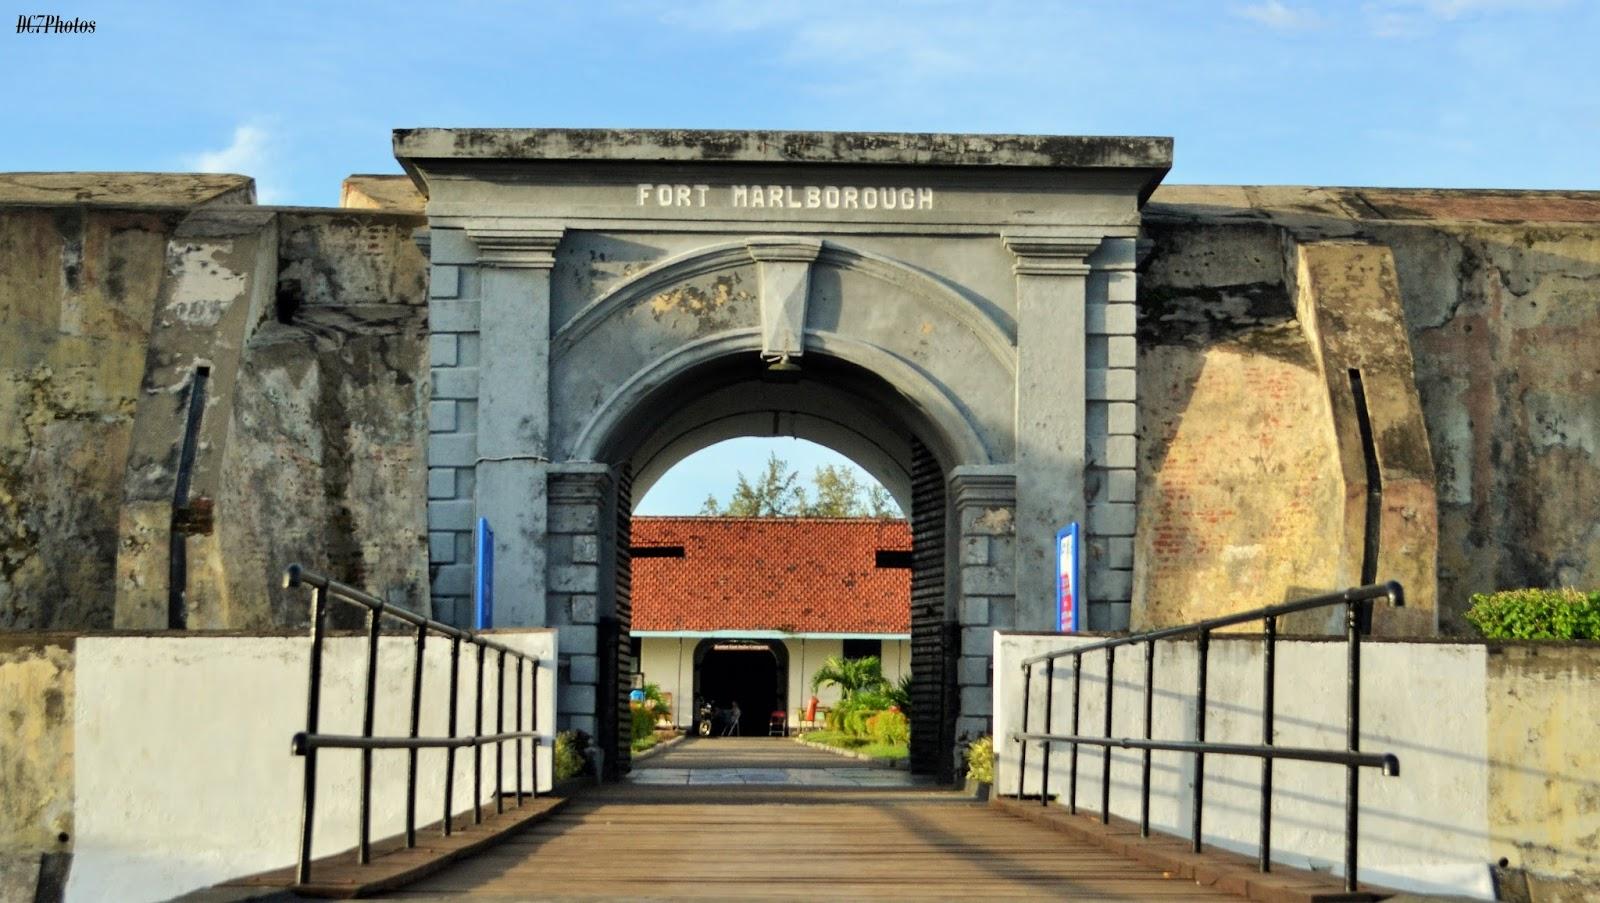 D3 Jurnalistik Universitas Bengkulu Benteng Marlborough Salah Satu Ikon Wisata